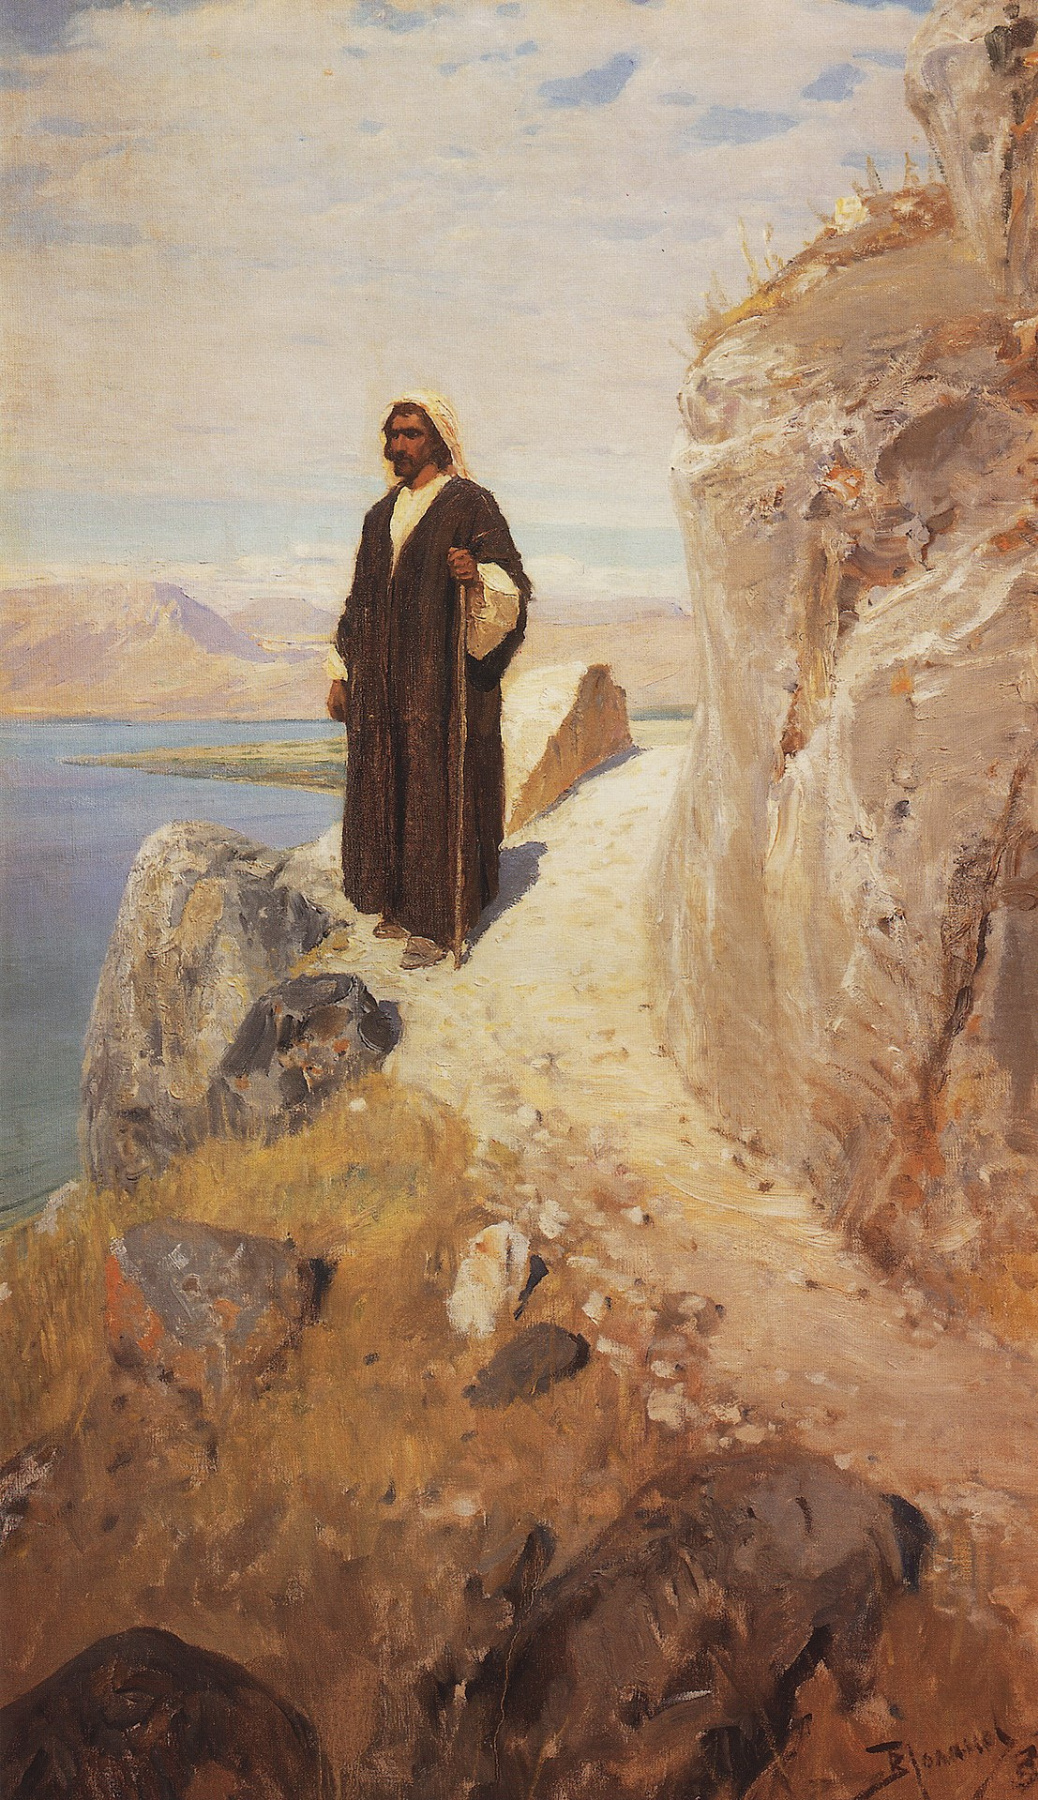 Vasily Polenov. Returned to Galilee in fortitude